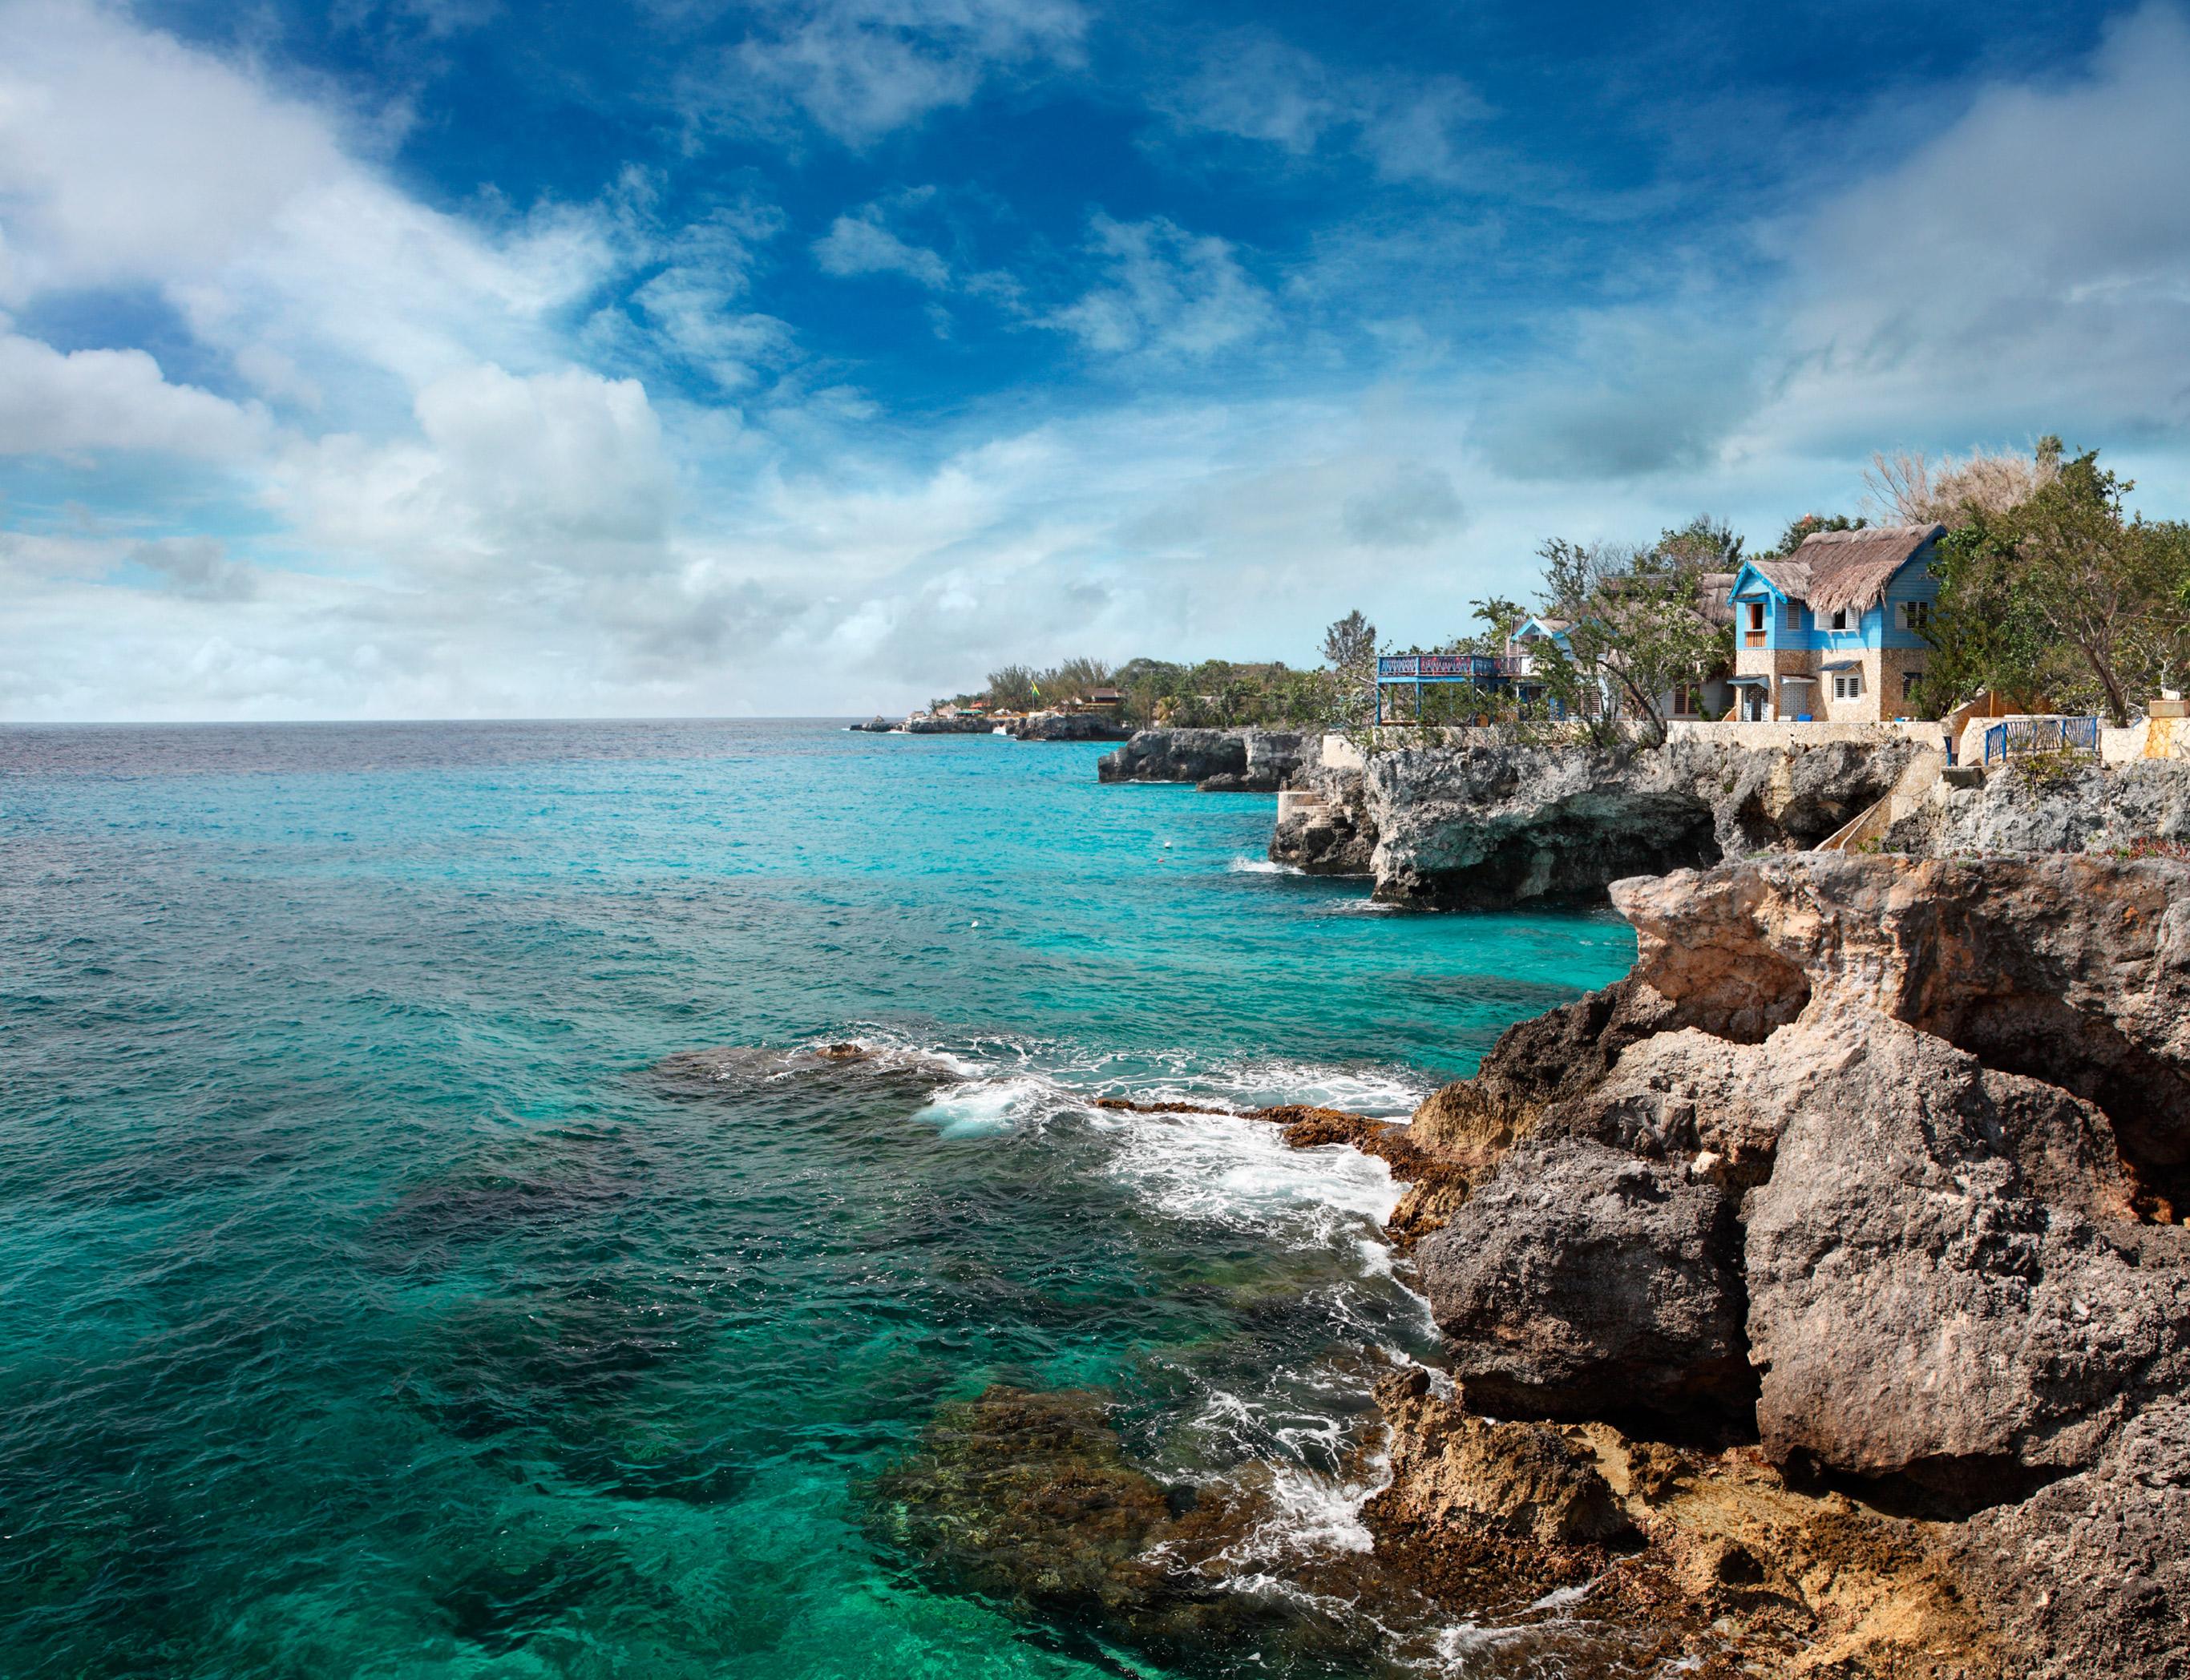 Jamaica's rocky shoreline in Negril.